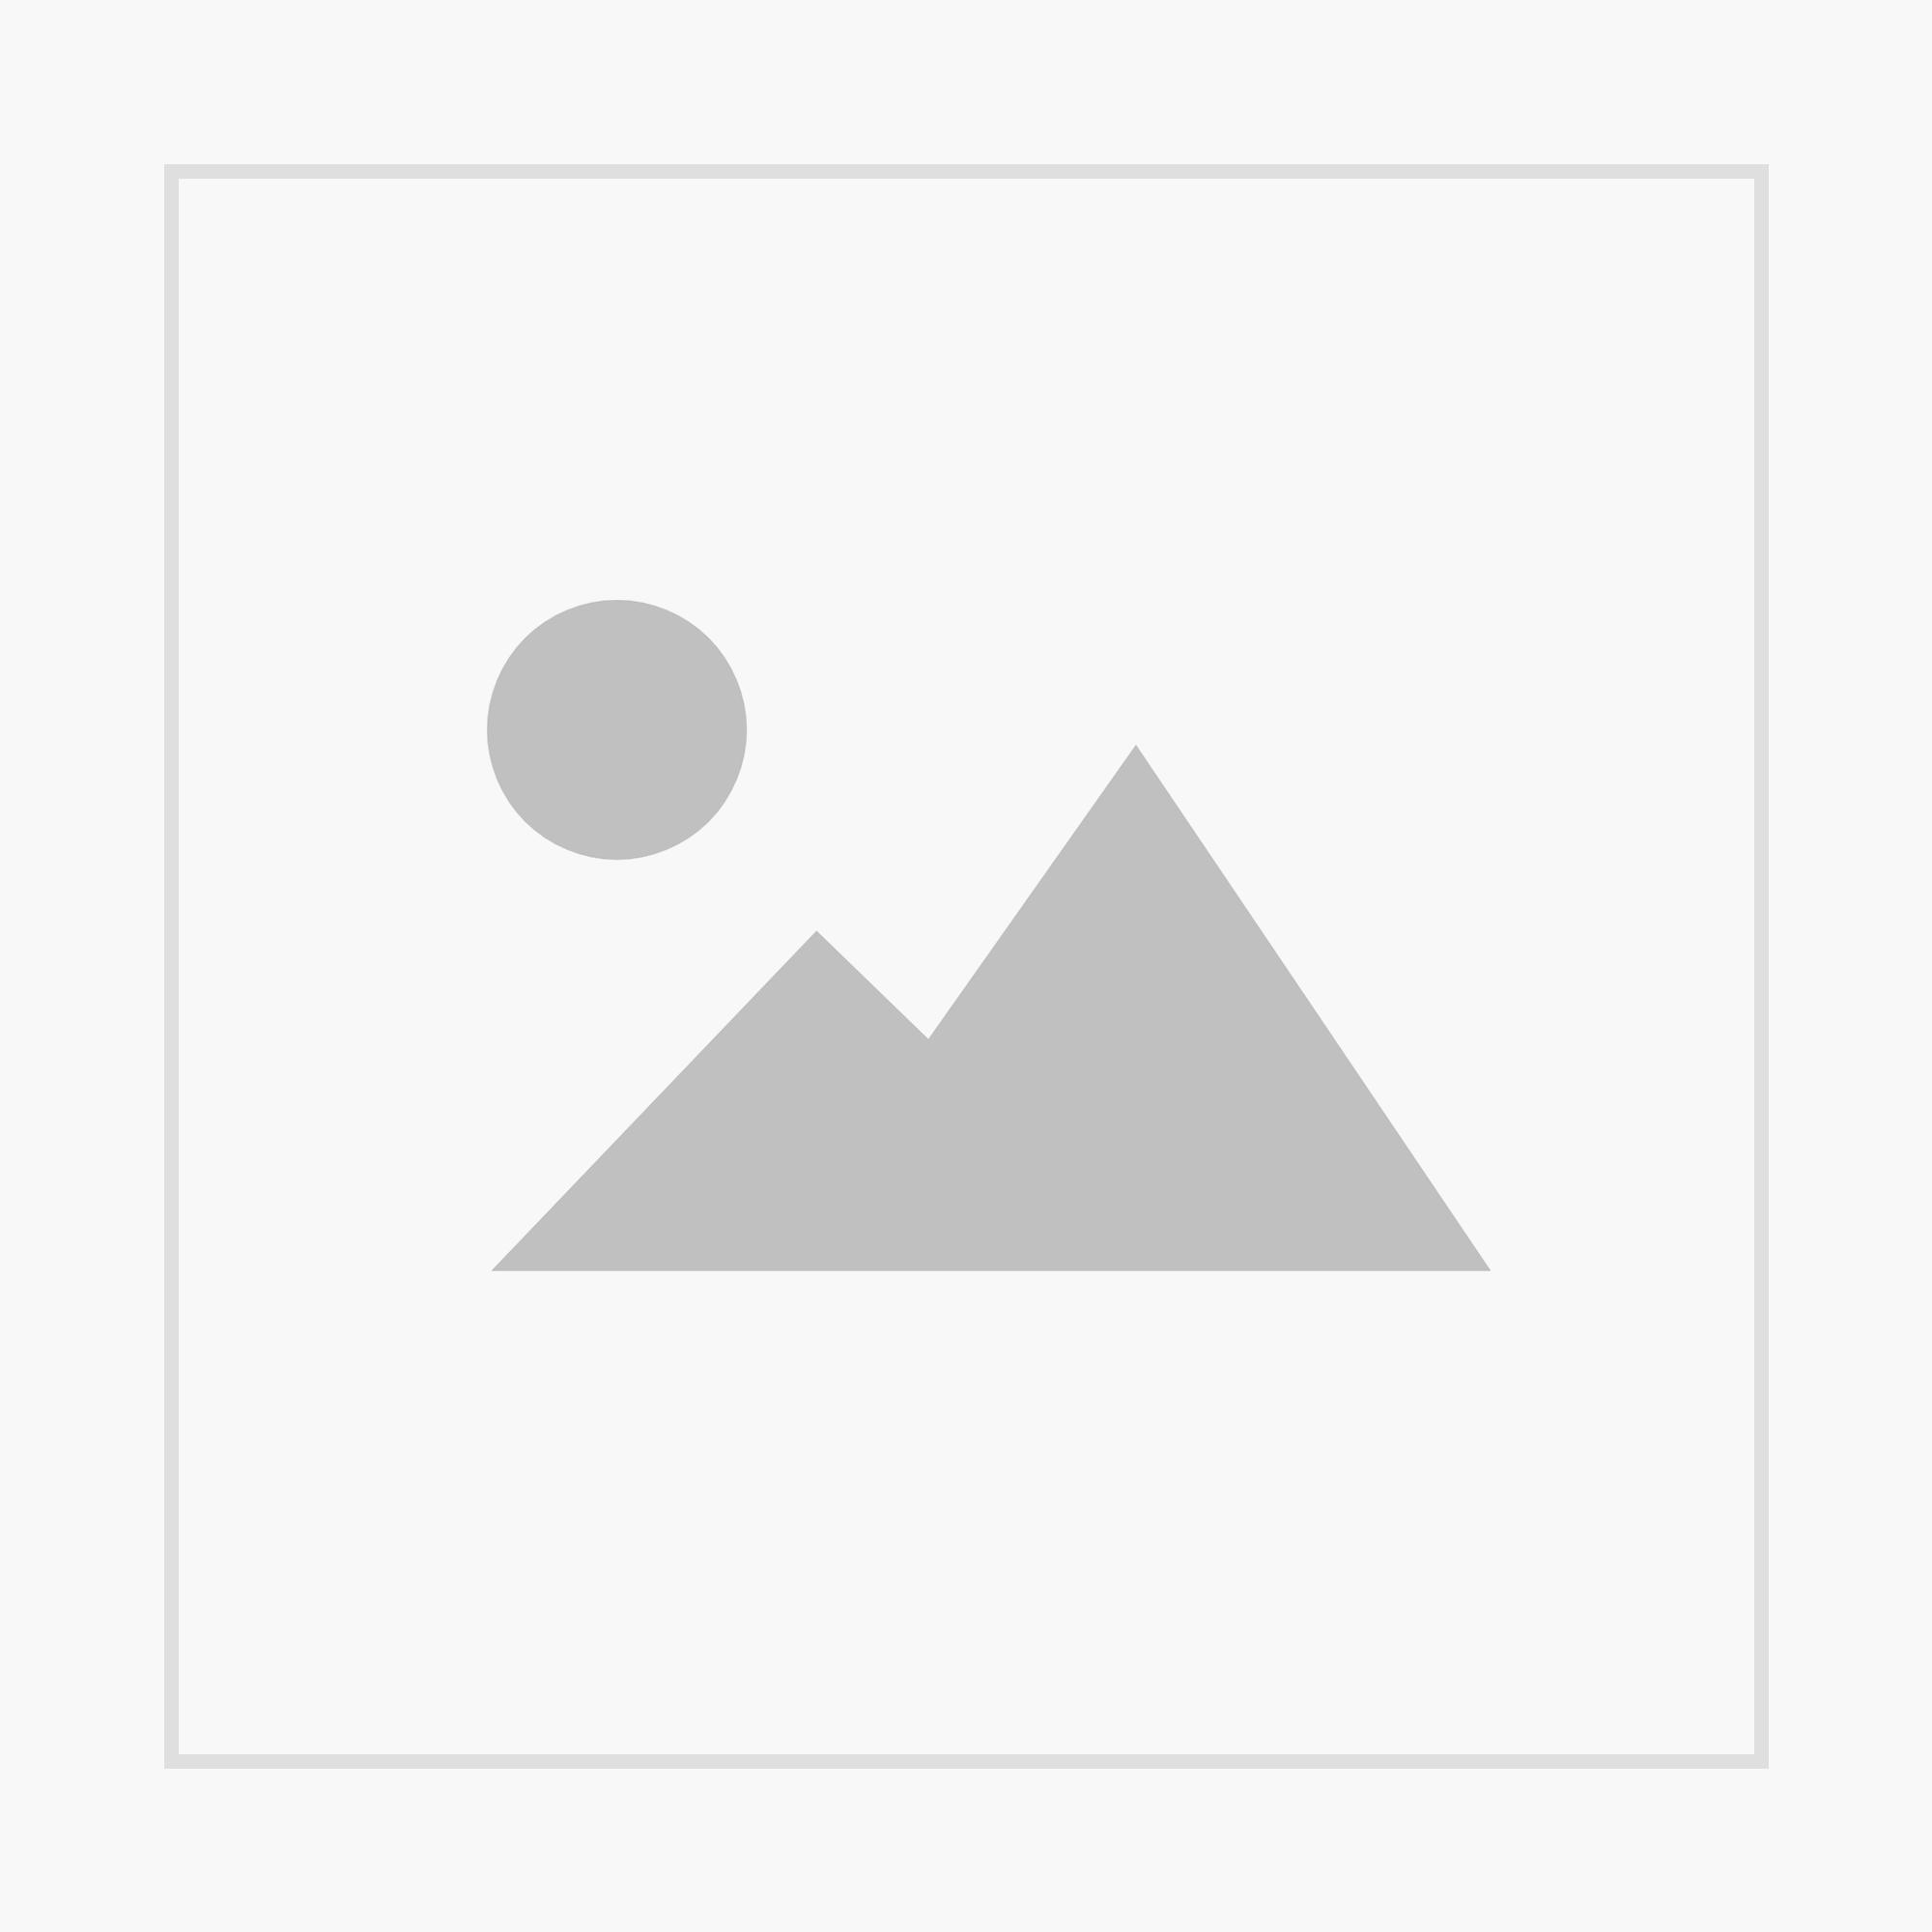 Land & Berge 1/2018